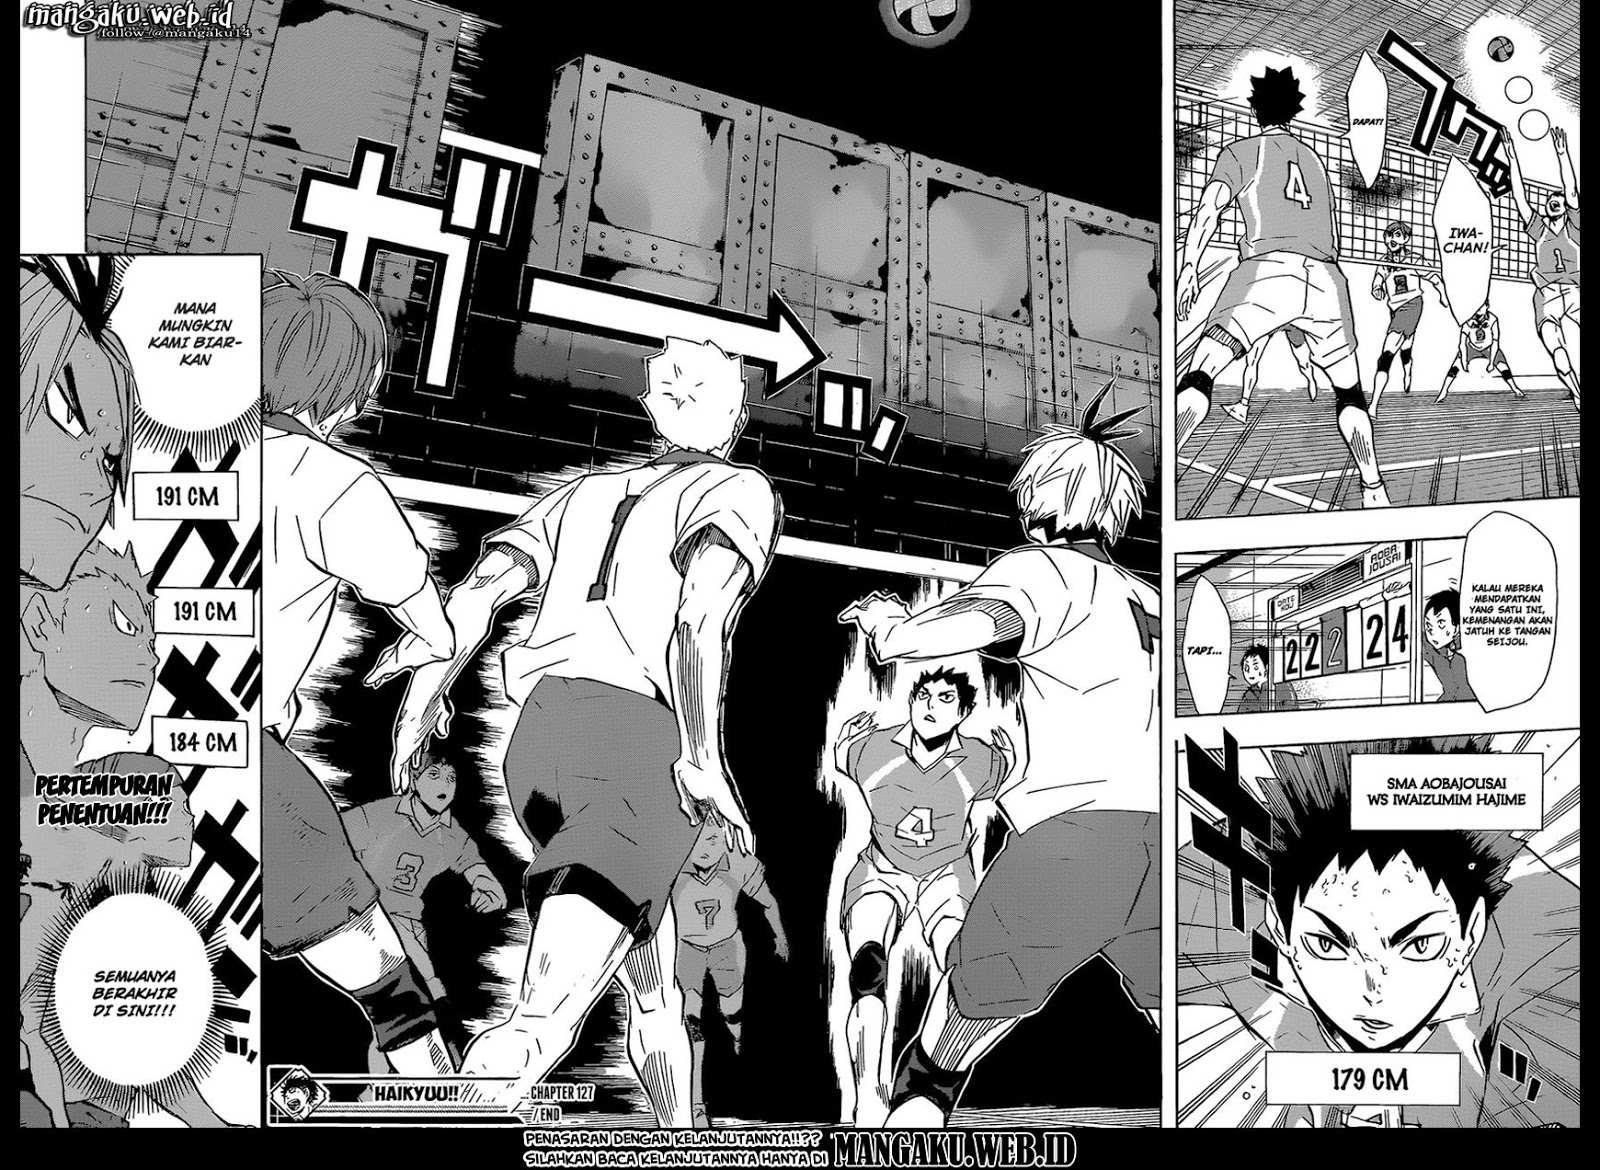 Haikyuu!!: Chapter 127 - Page 19